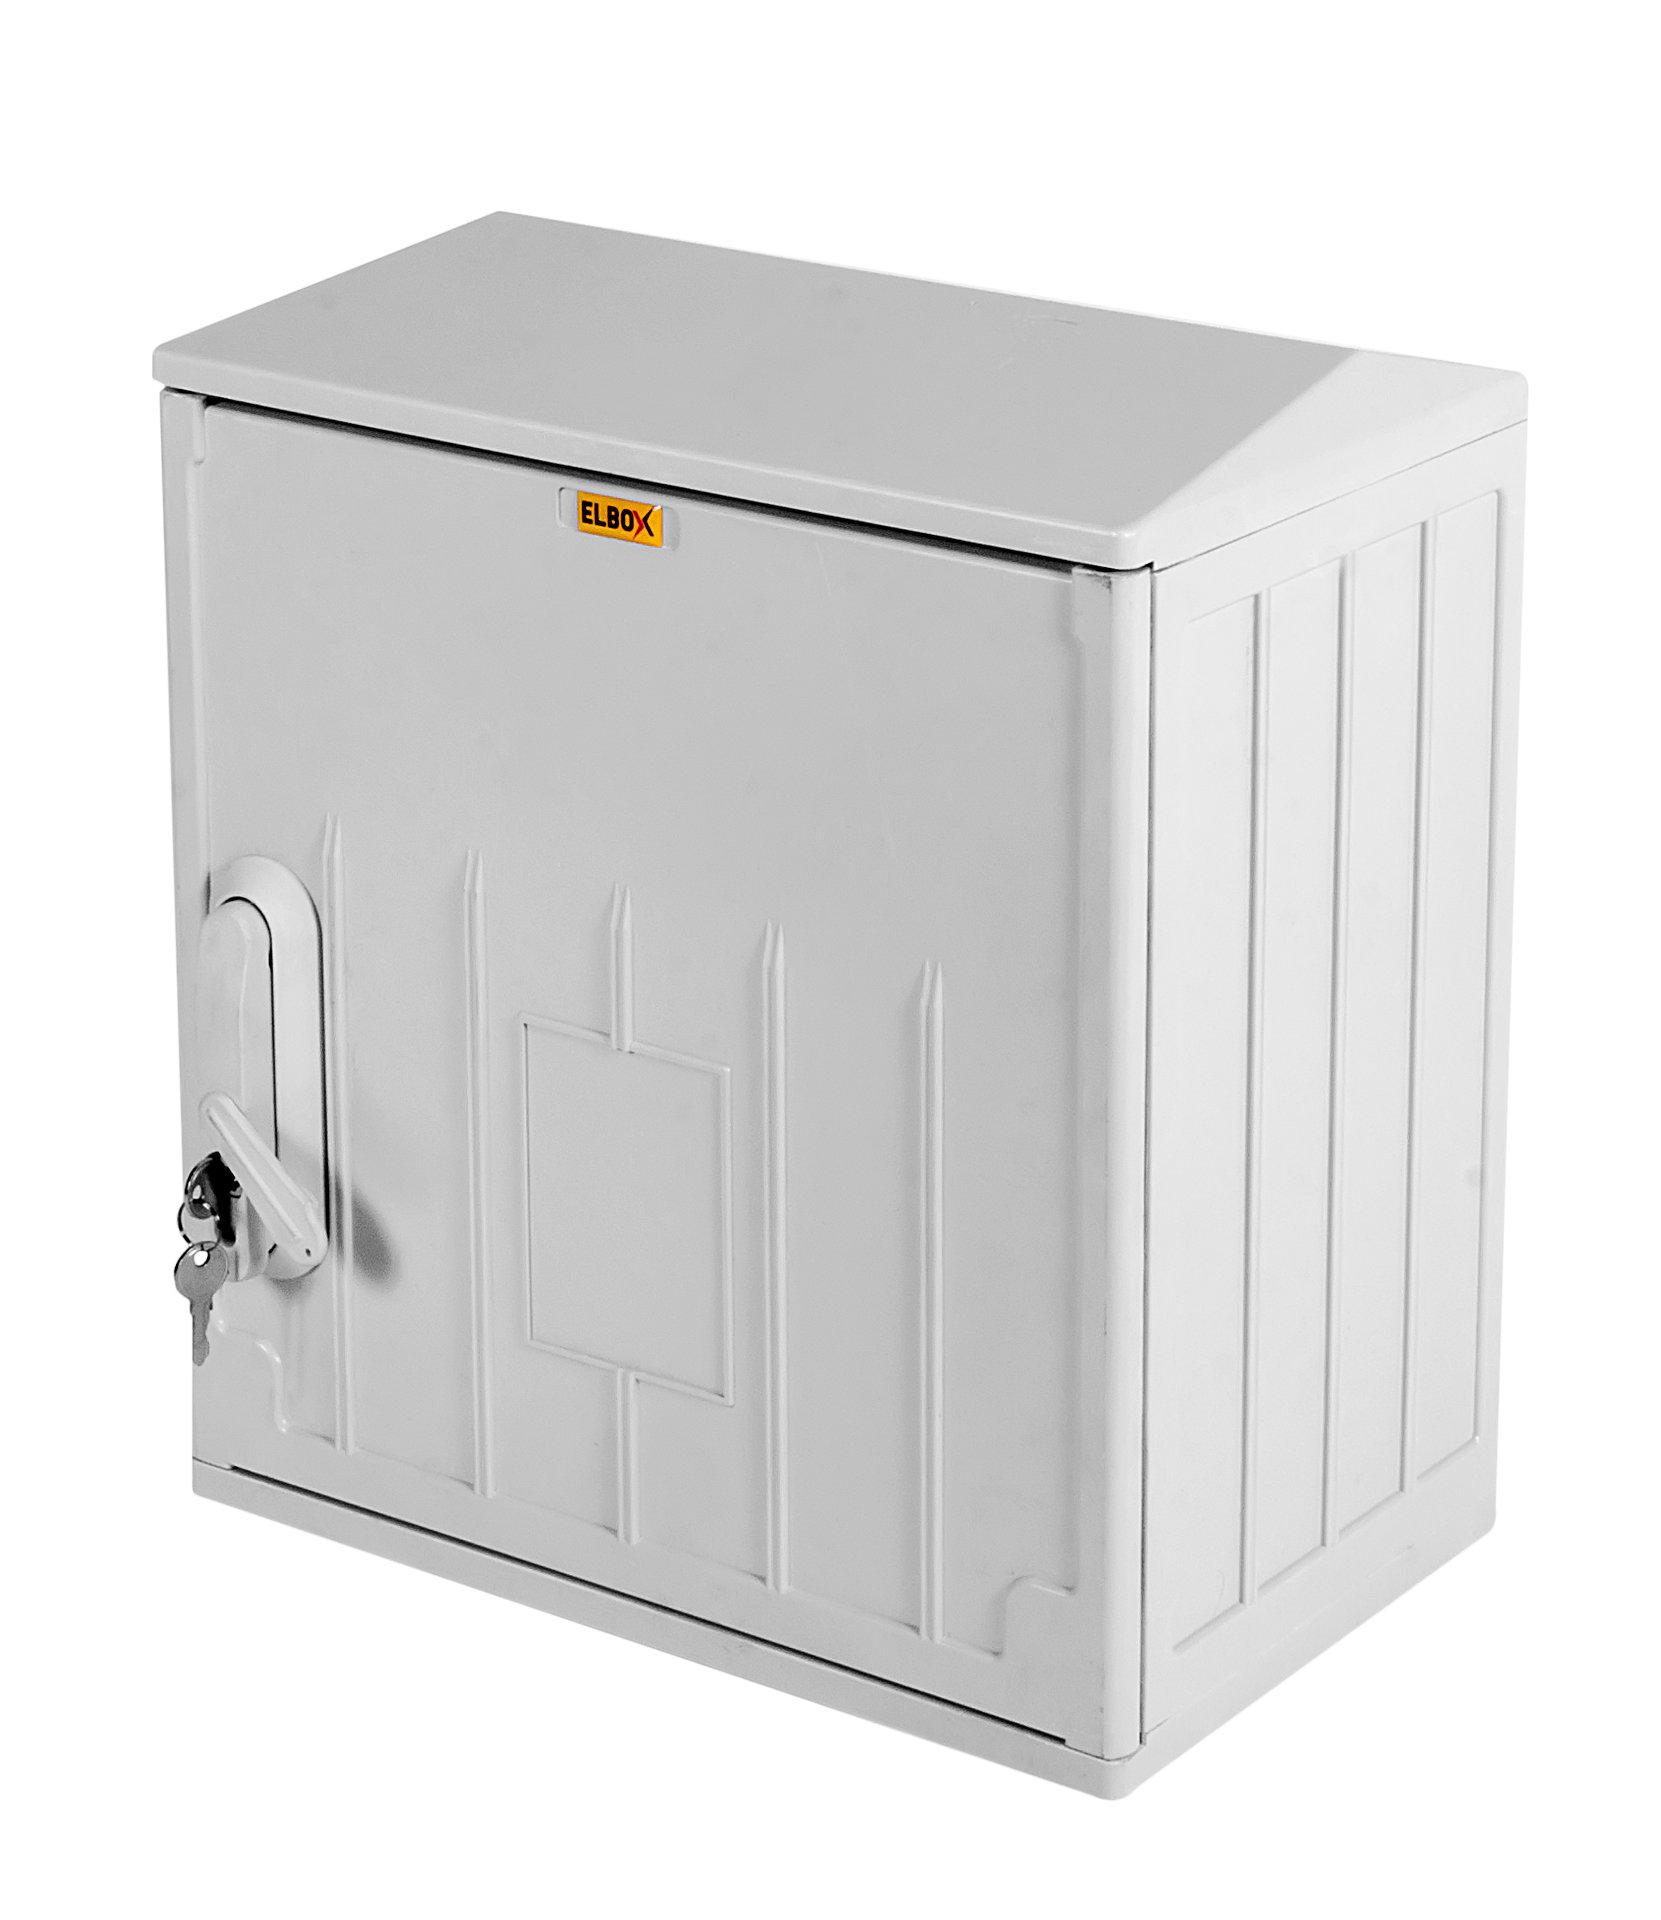 EPV-400.400.250-1-IP54 Шкаф электротехнический настенный Elbox EPV IP54 400х400х250 мм (ВхШхГ) дверь: сплошная корпус: полиэстер цвет: серый